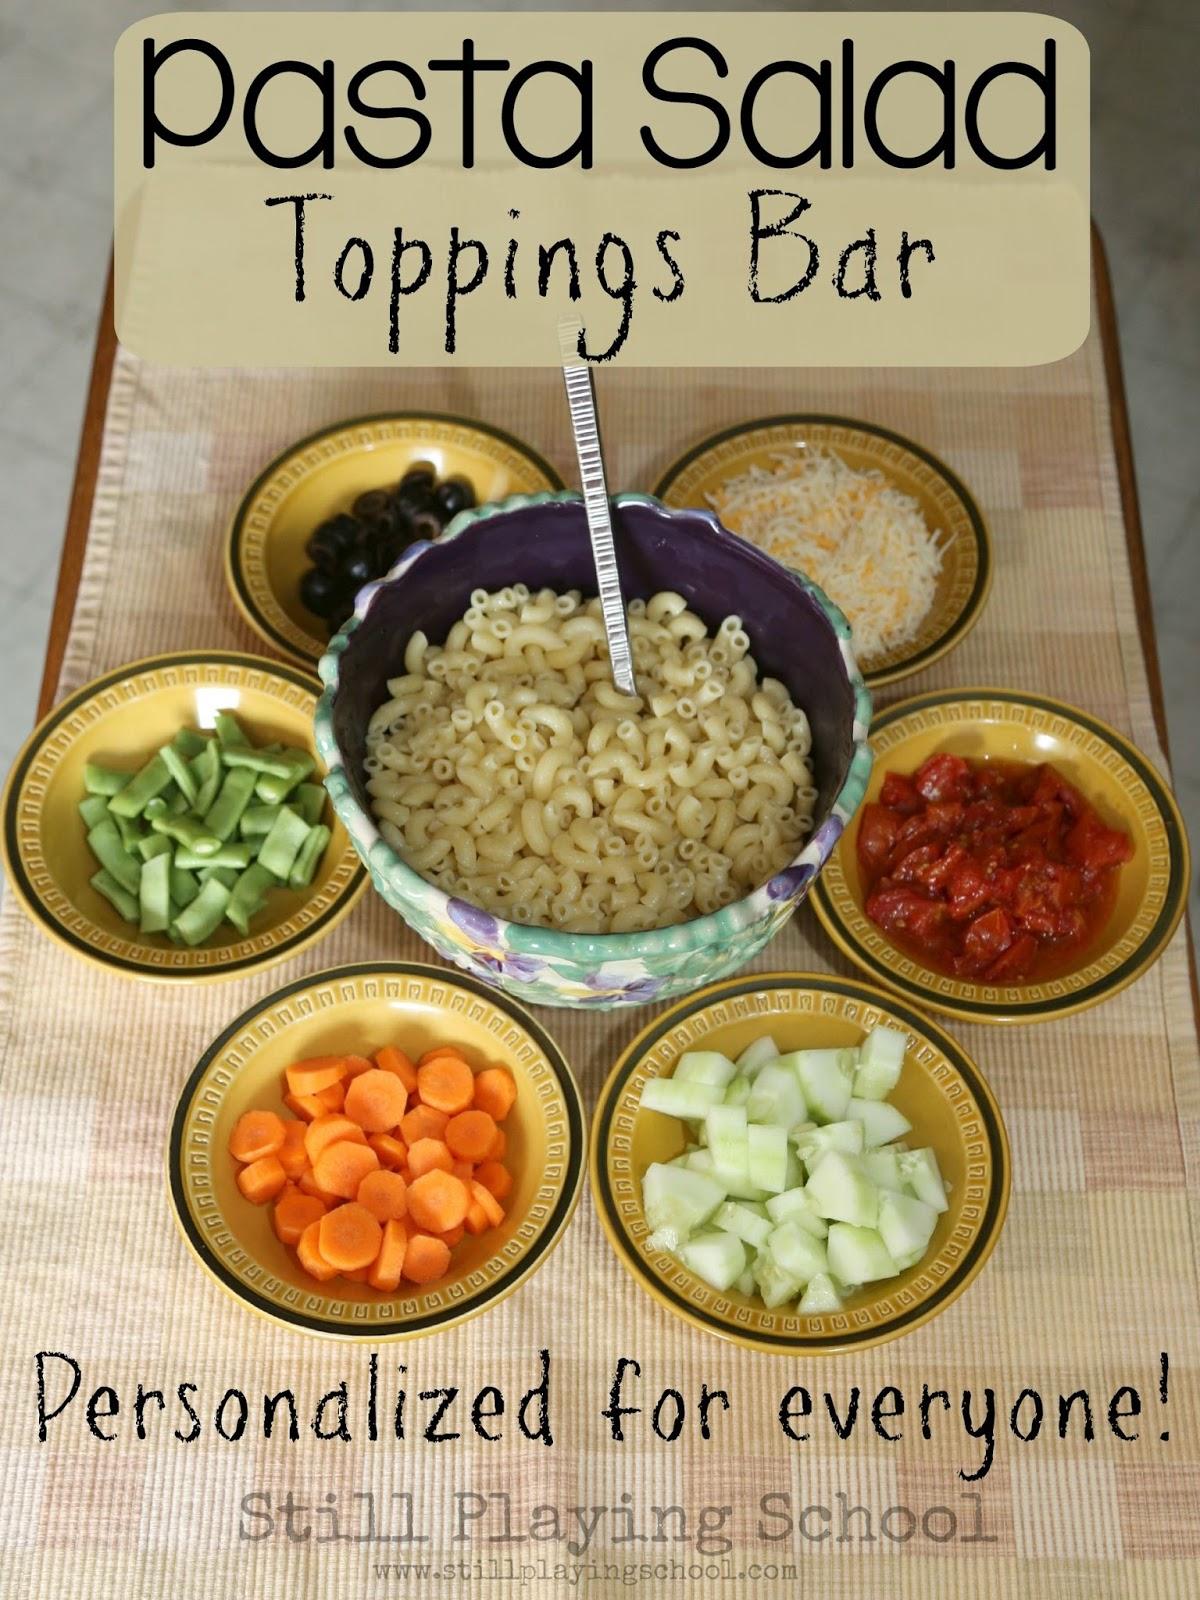 Make Your Own Pasta Salad Bar | Still Playing School